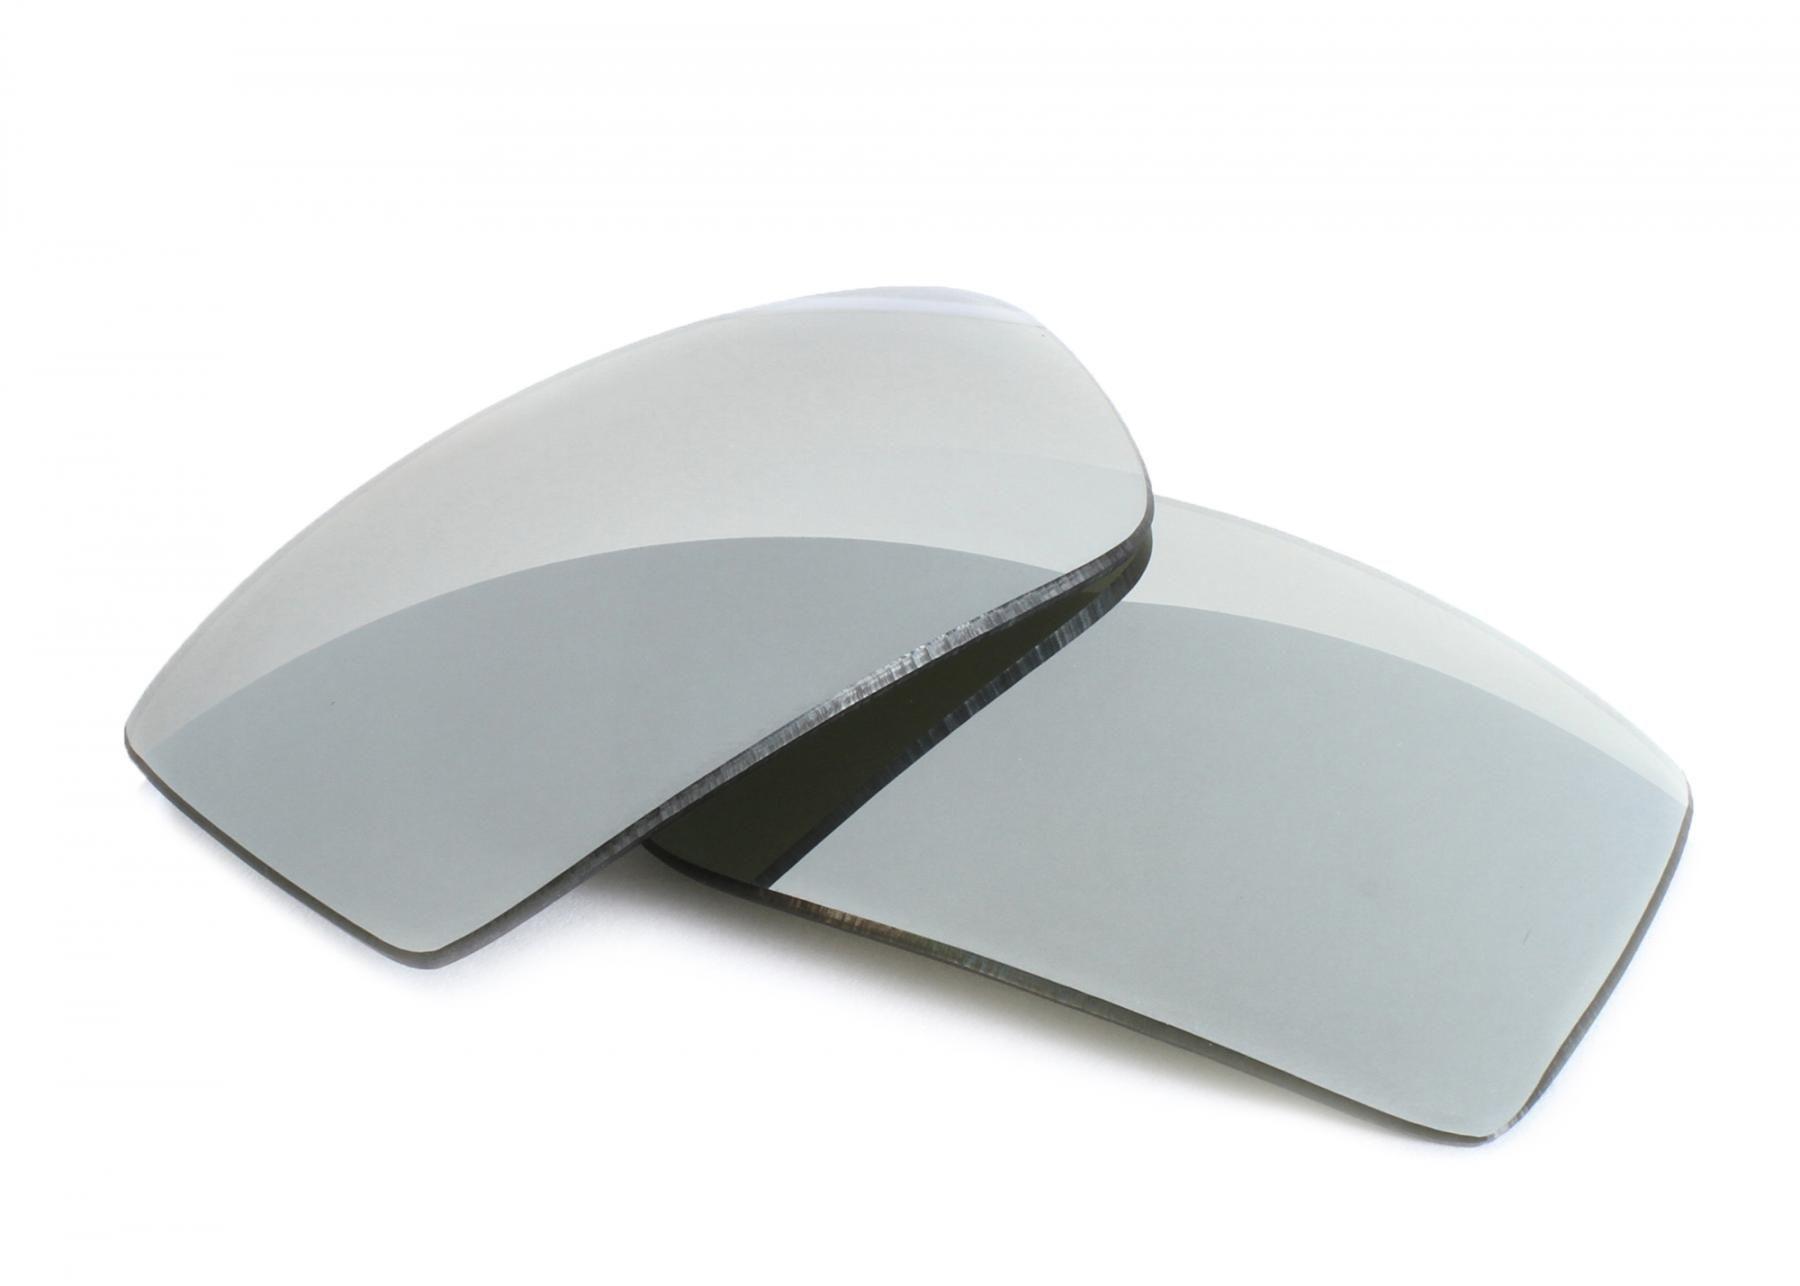 8a2ecbf2d2cf Oakley Square Whisker Grey Lens Chrome Mirror Replacement Lenses ...